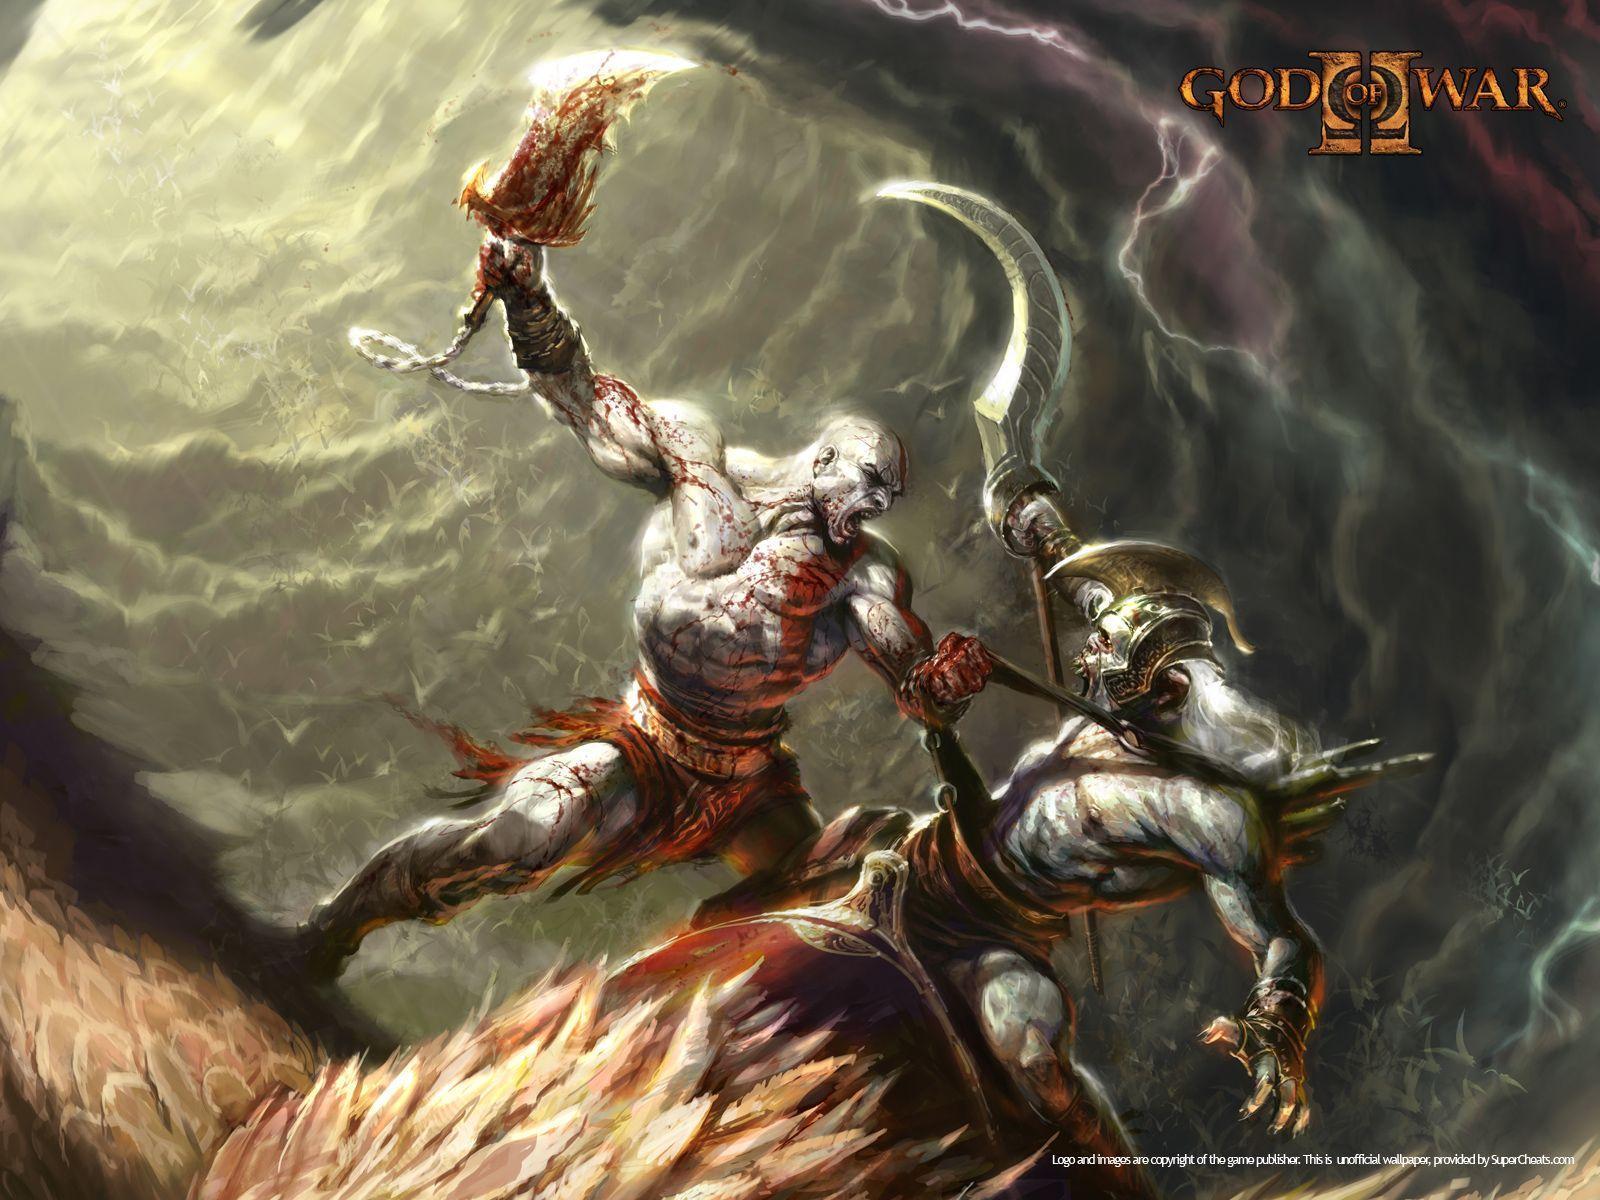 God Of War Ii Wallpapers Wallpaper Cave